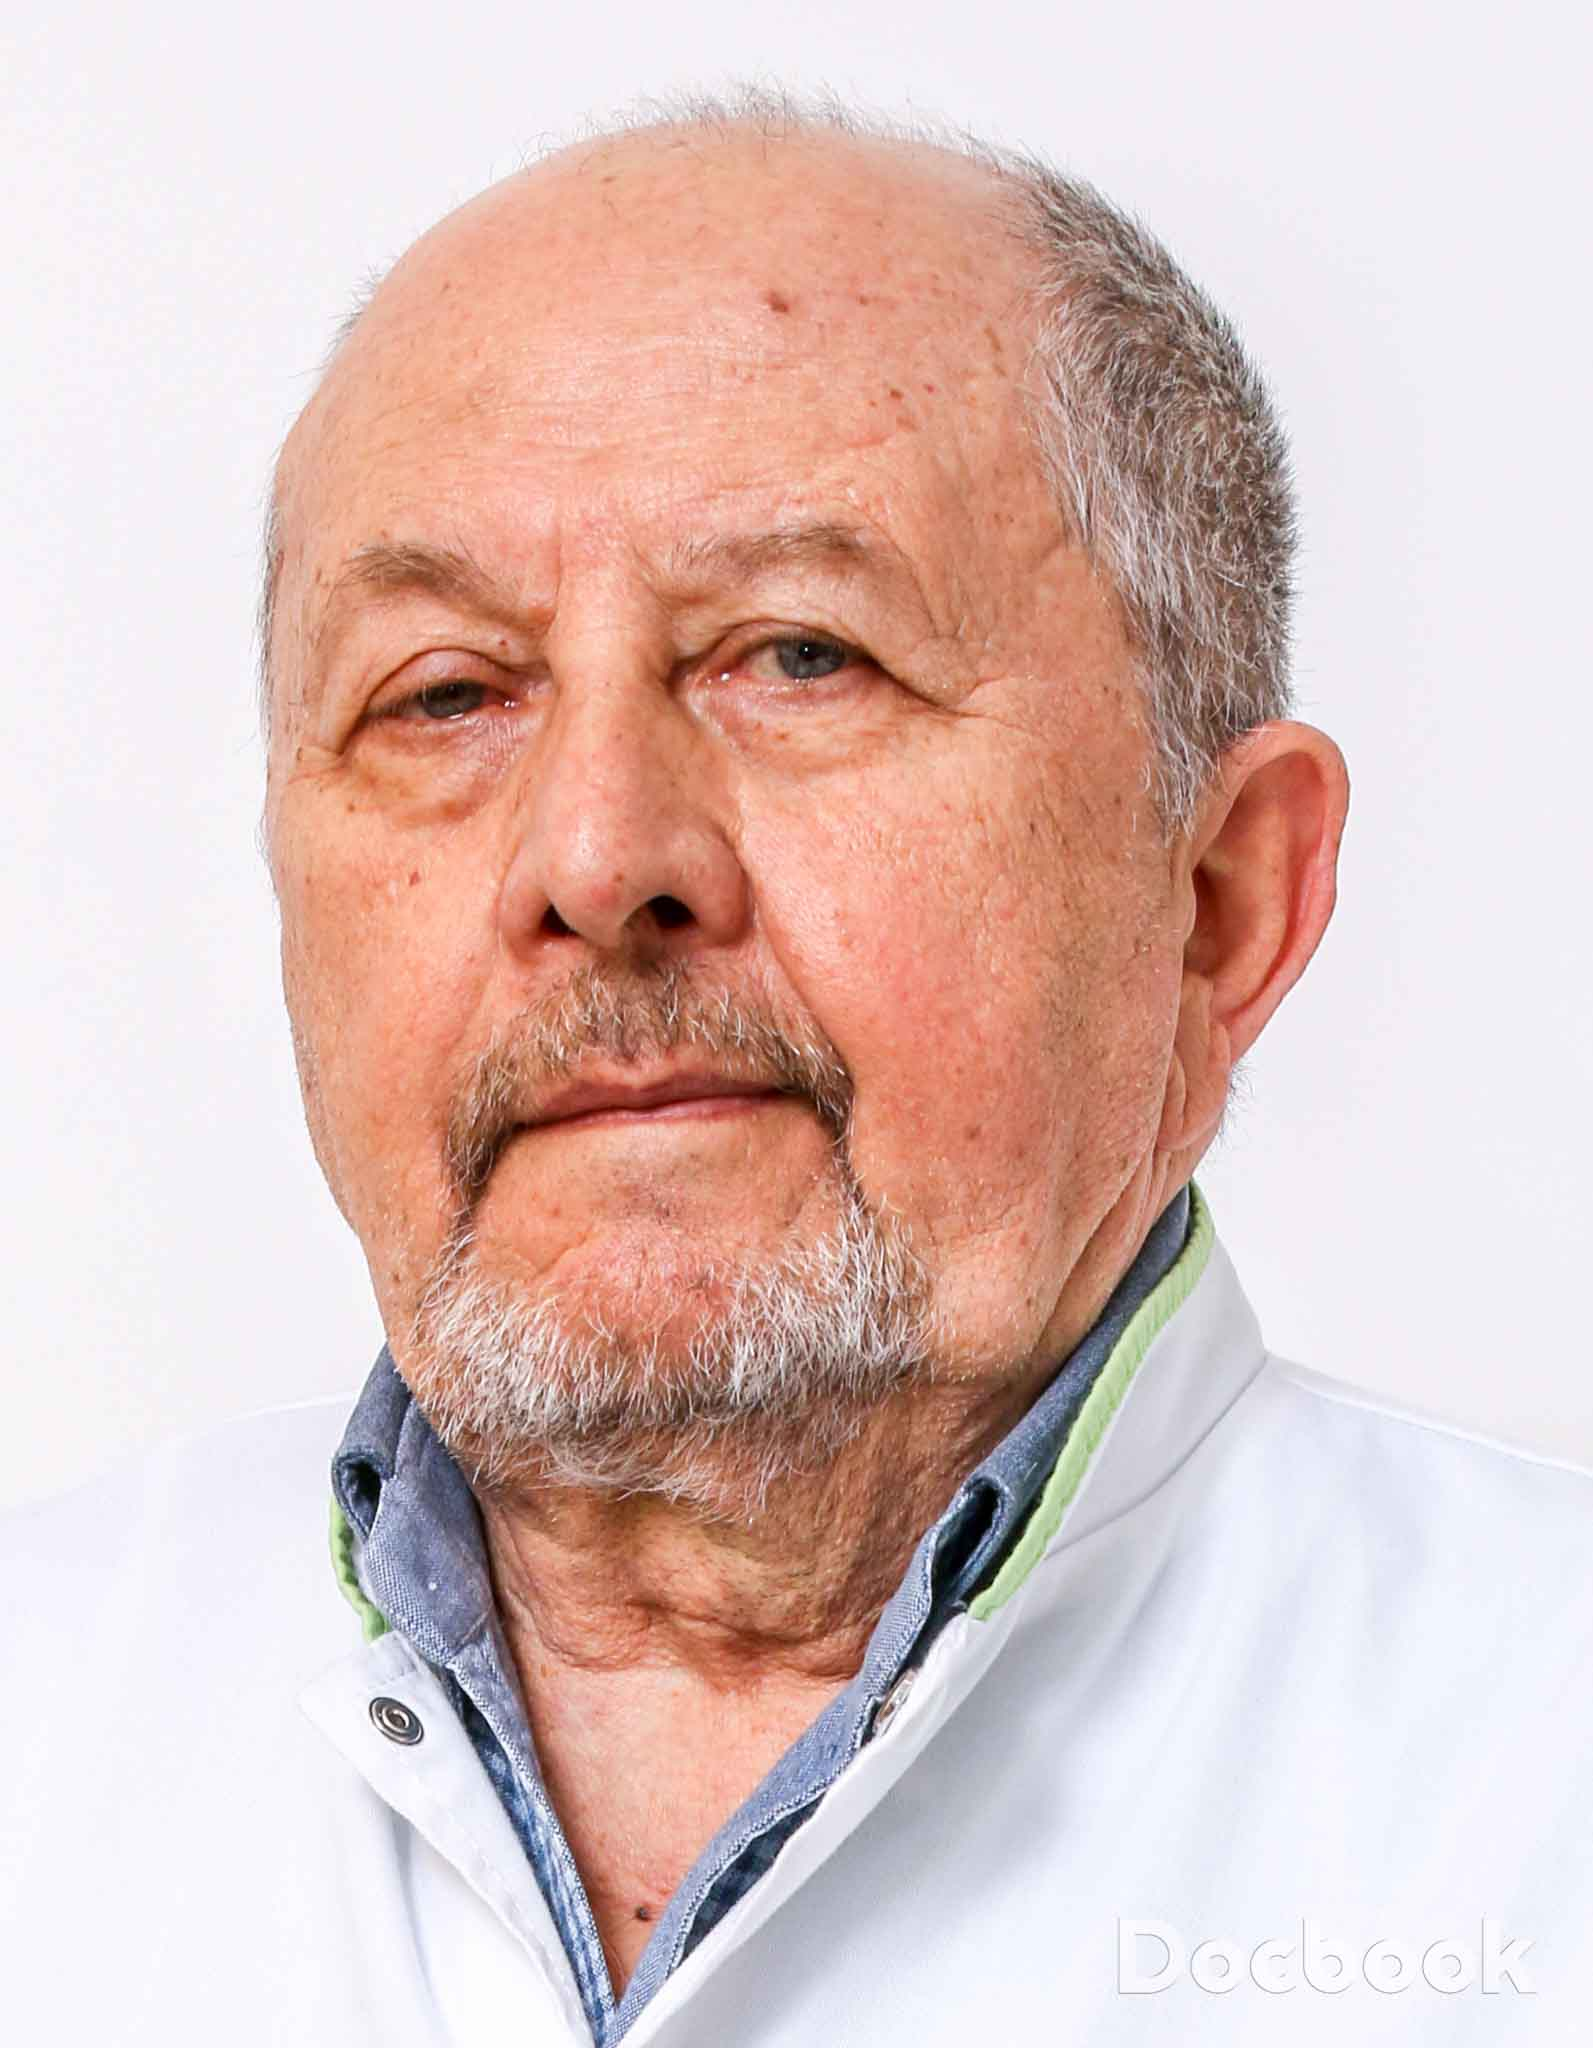 Dr. Iliescu Lucian